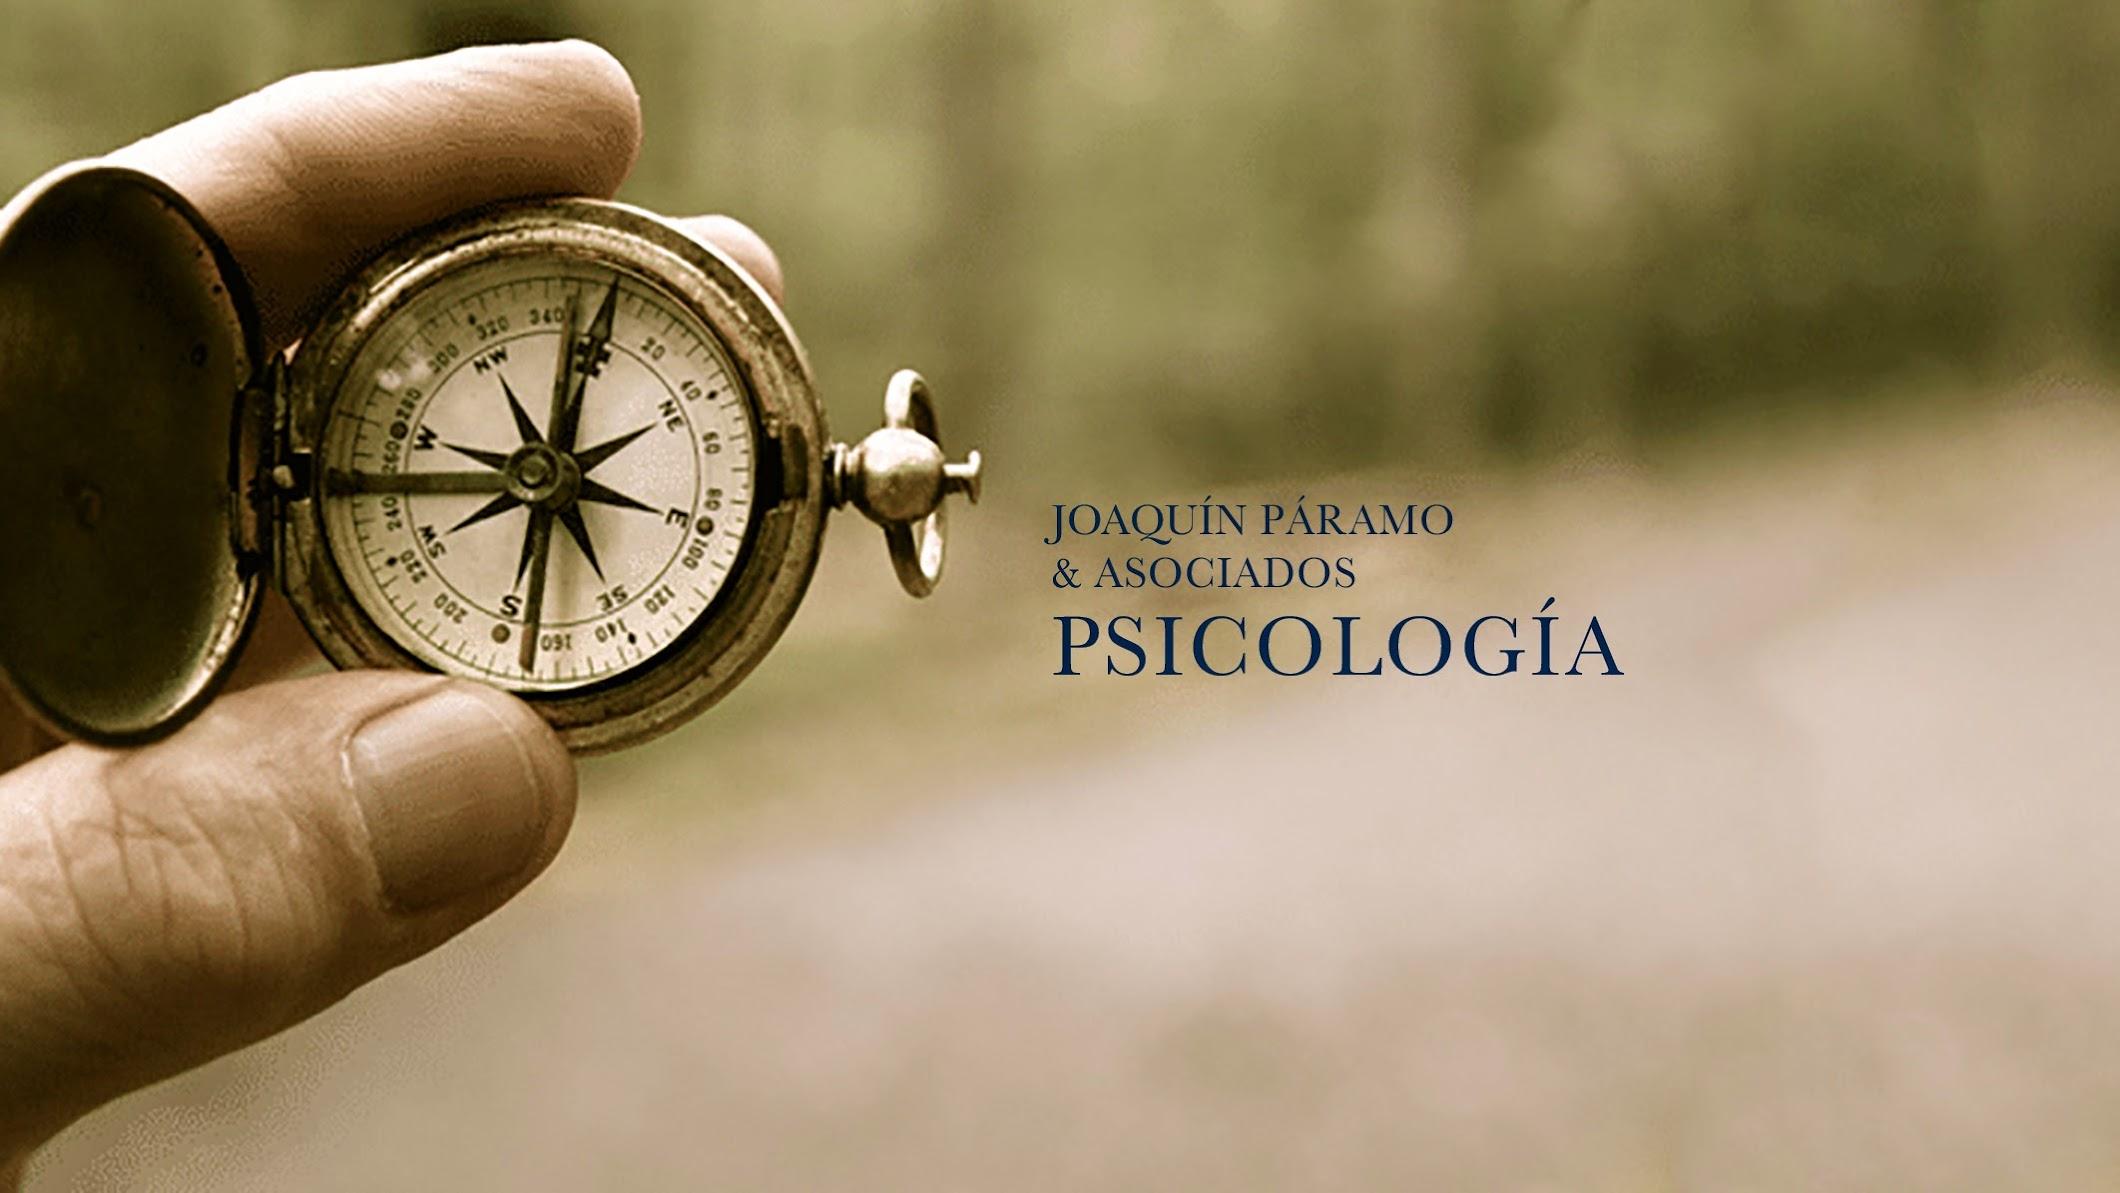 Joaquín Páramo & Asociados / Psicología